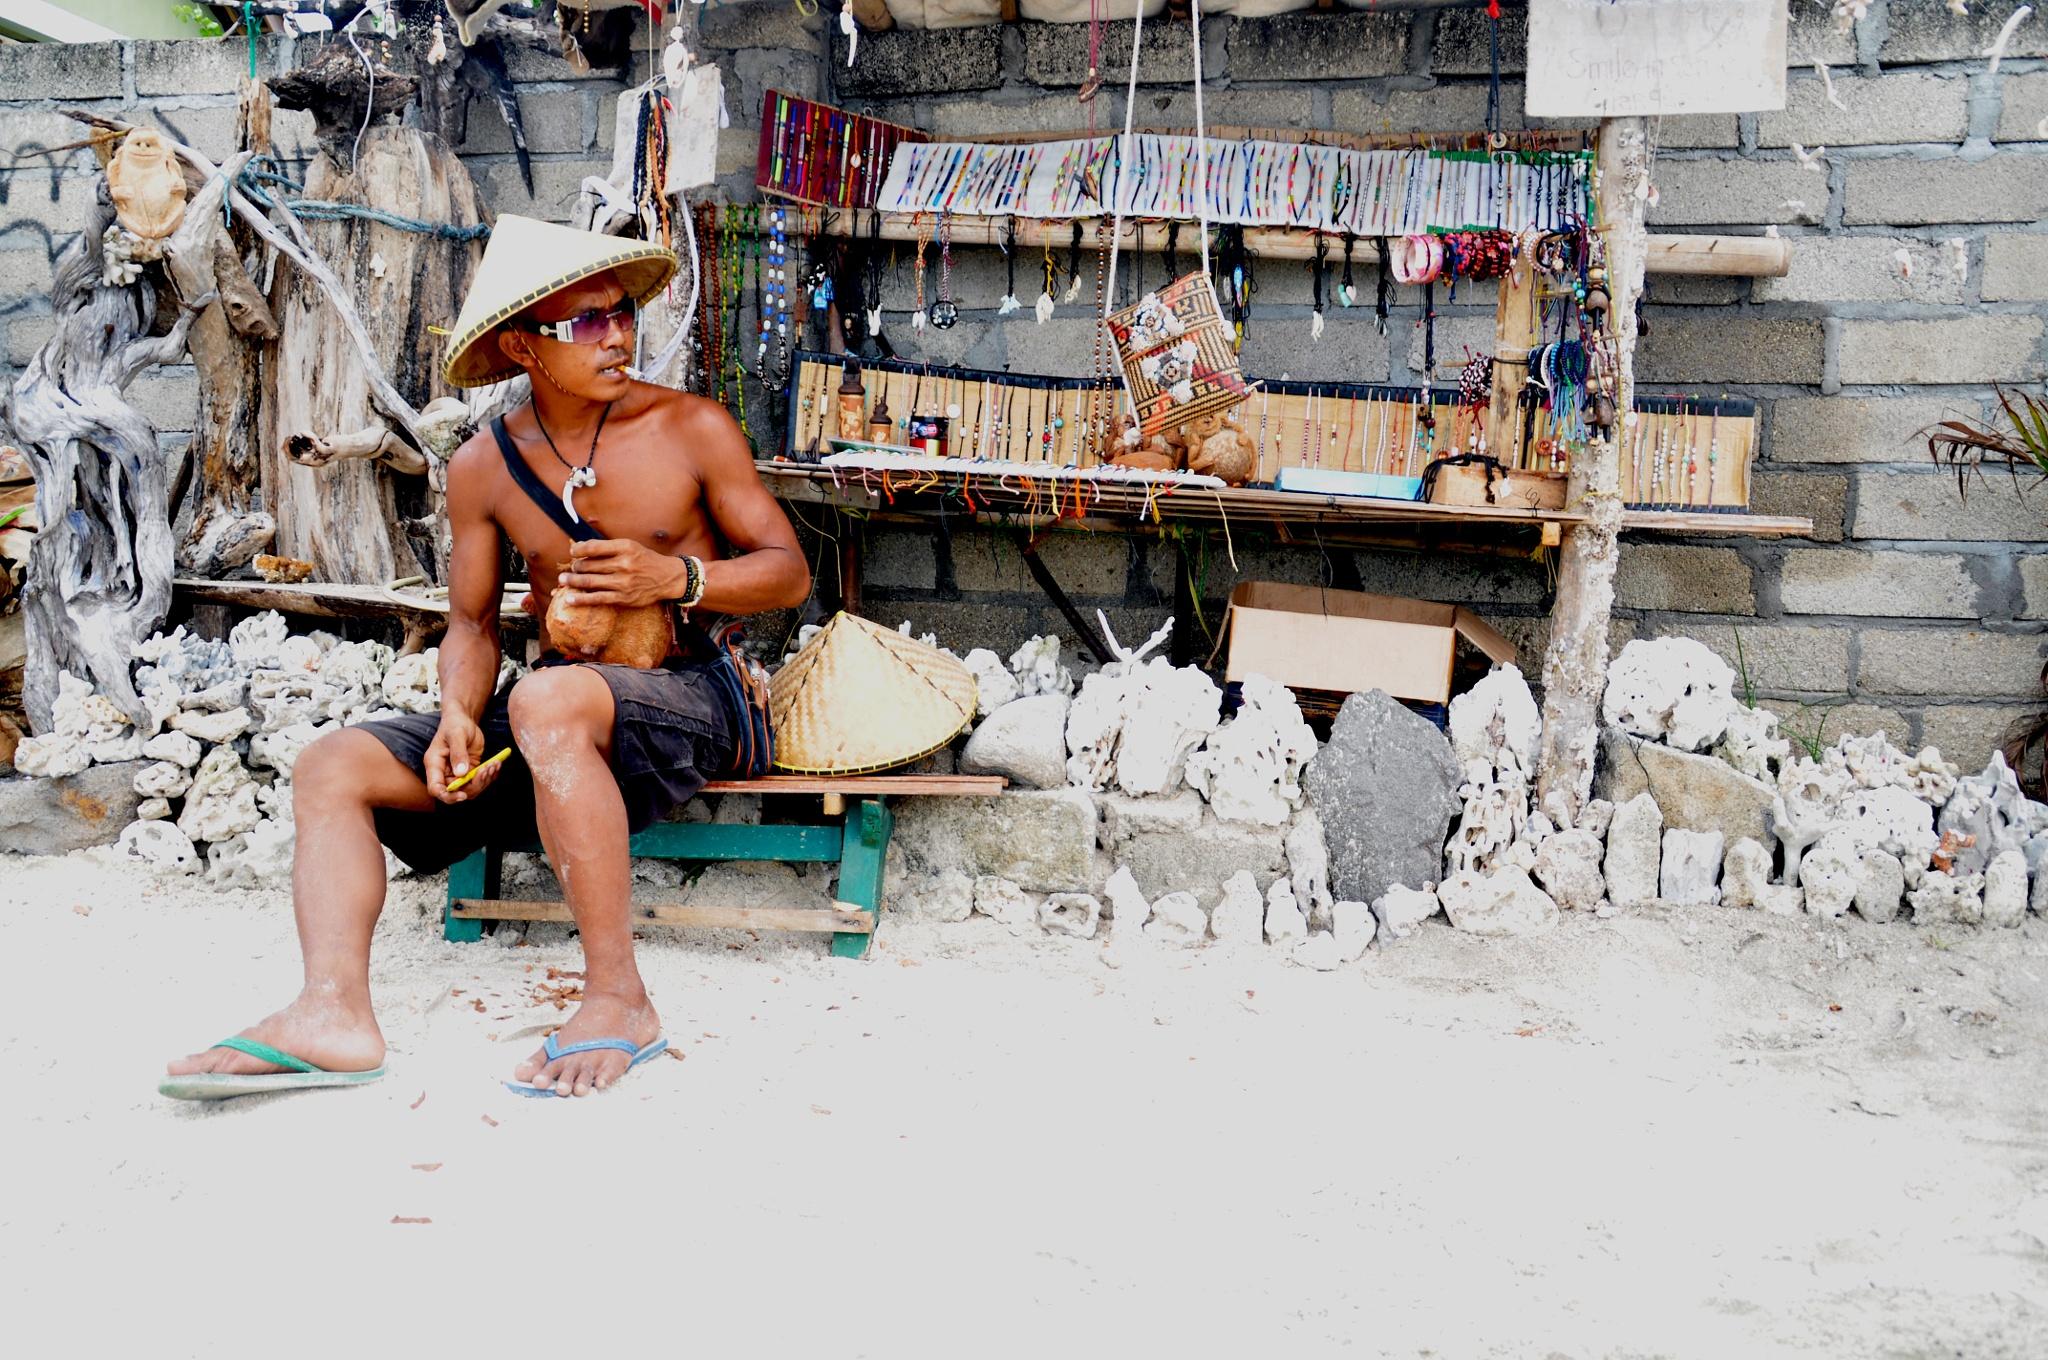 Waiting for Buyer by martoyosetiawan